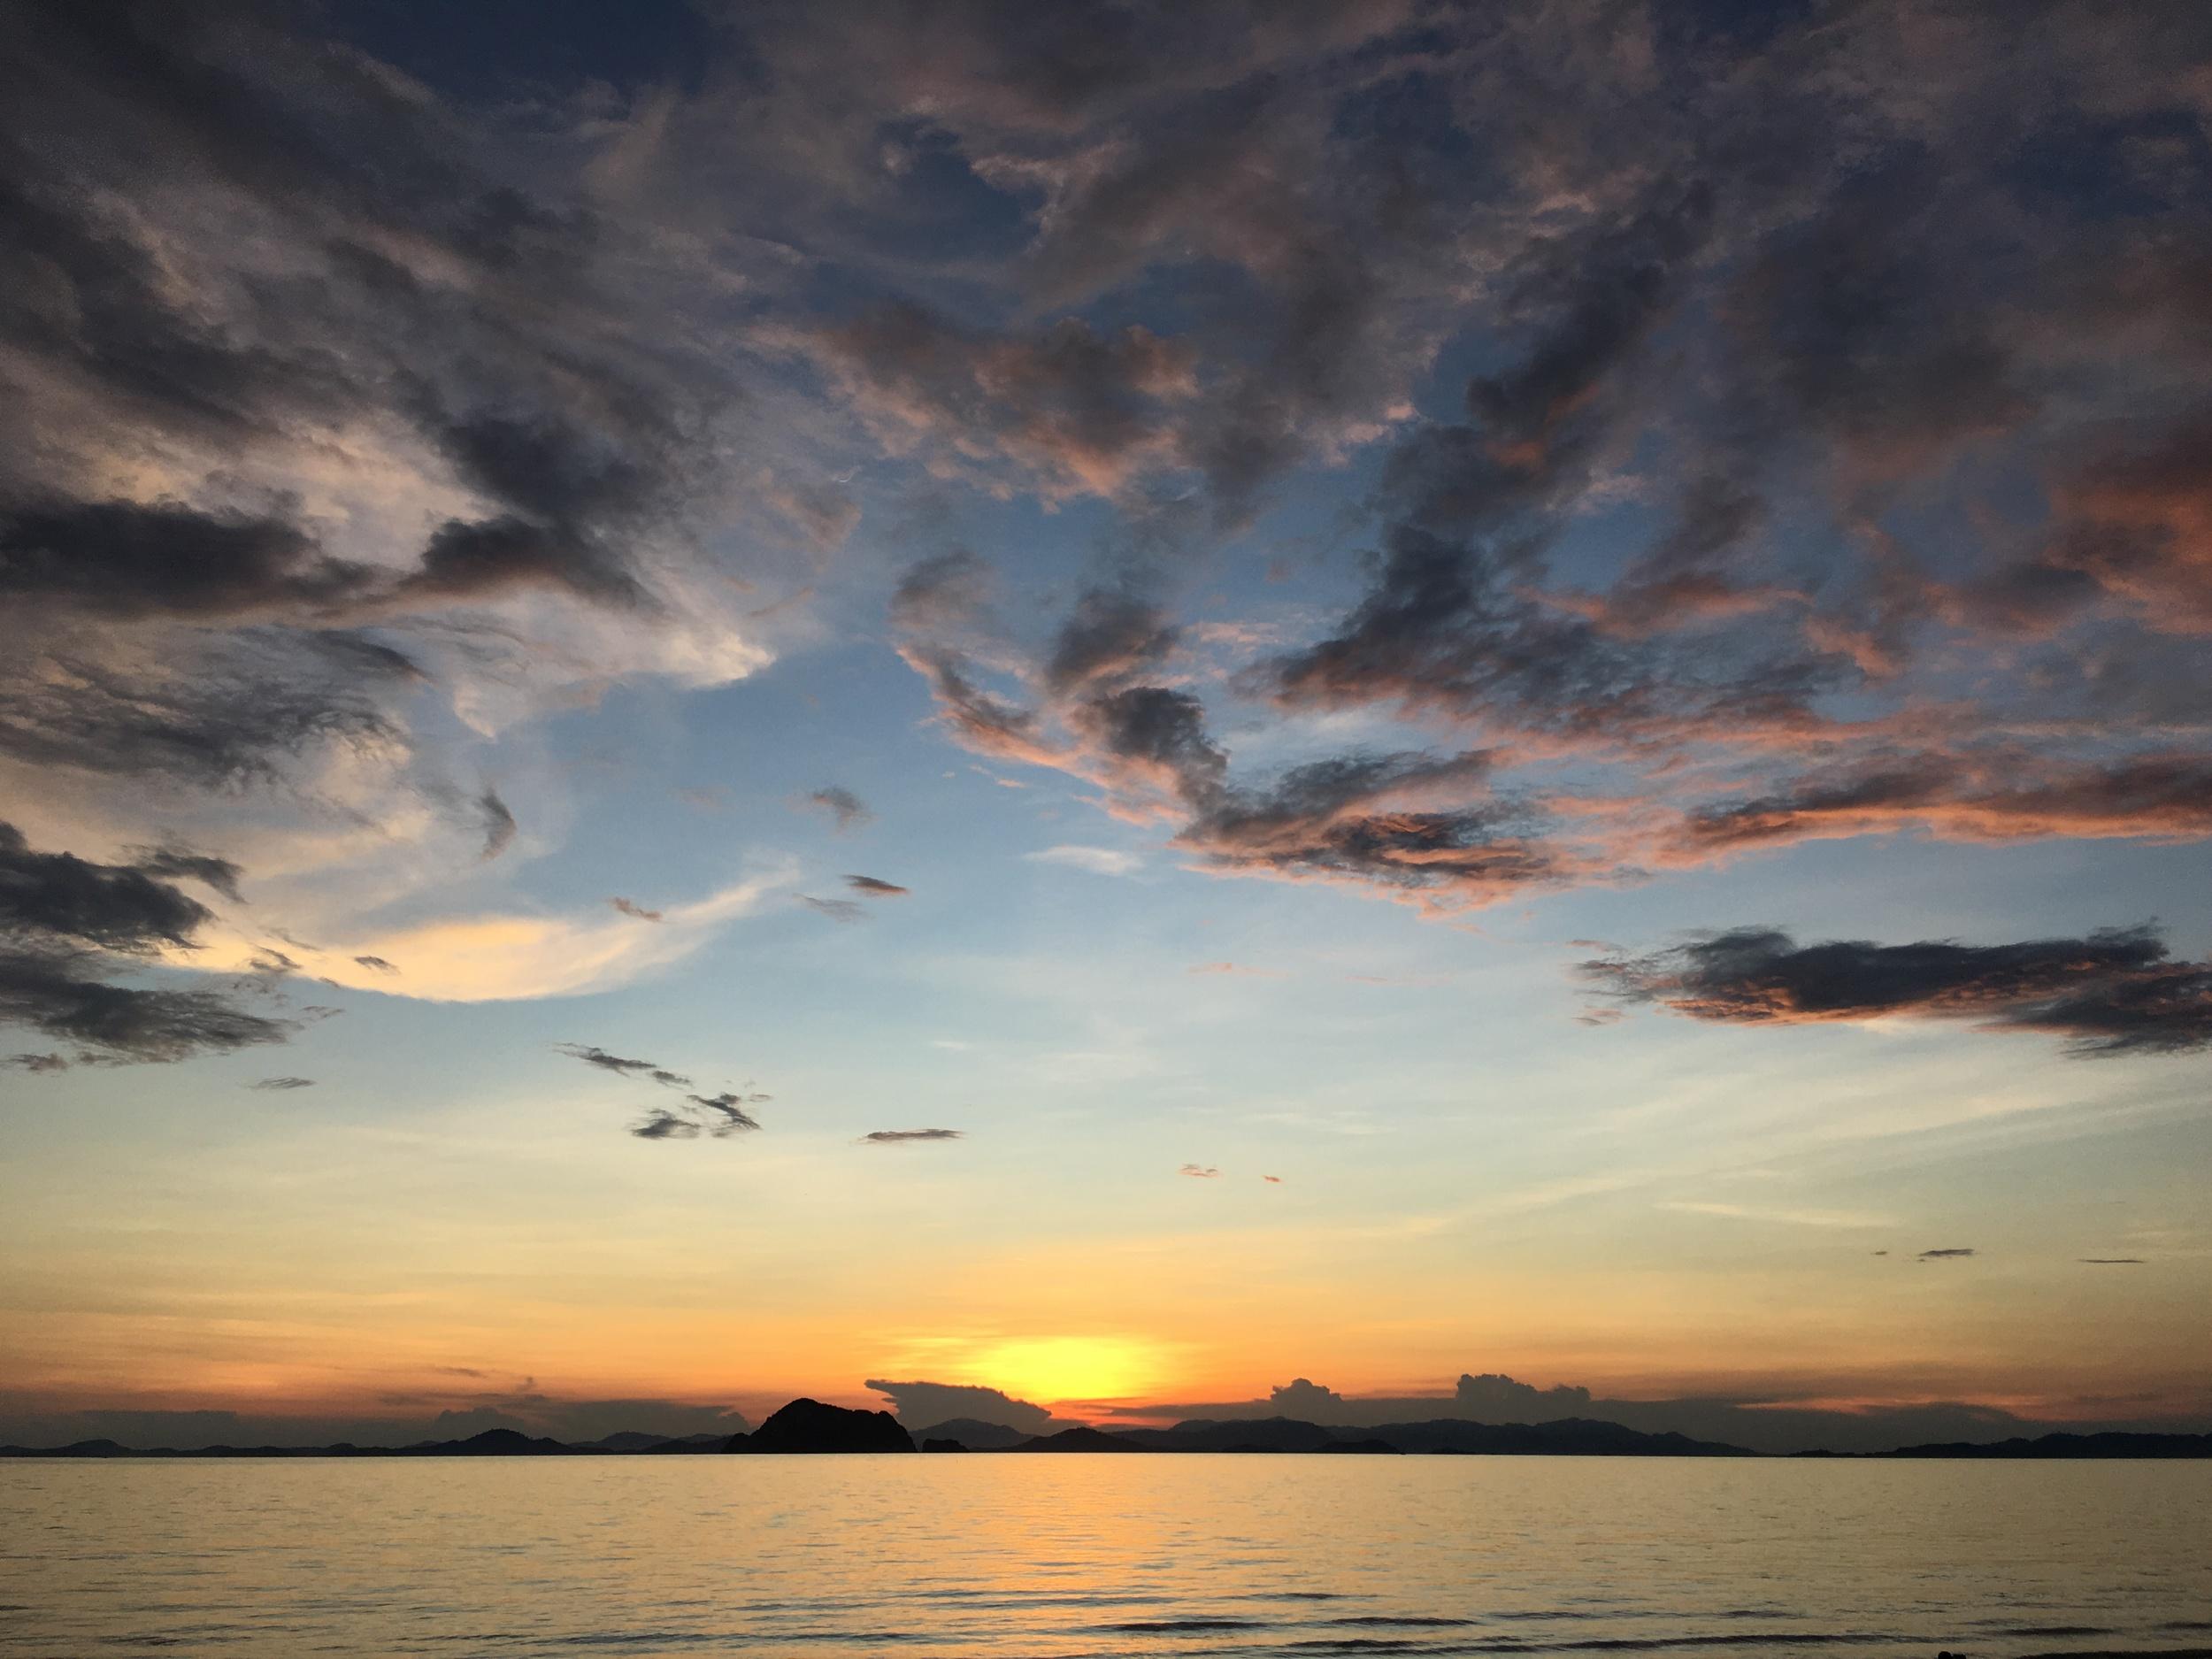 One of the many amazing sunsets.